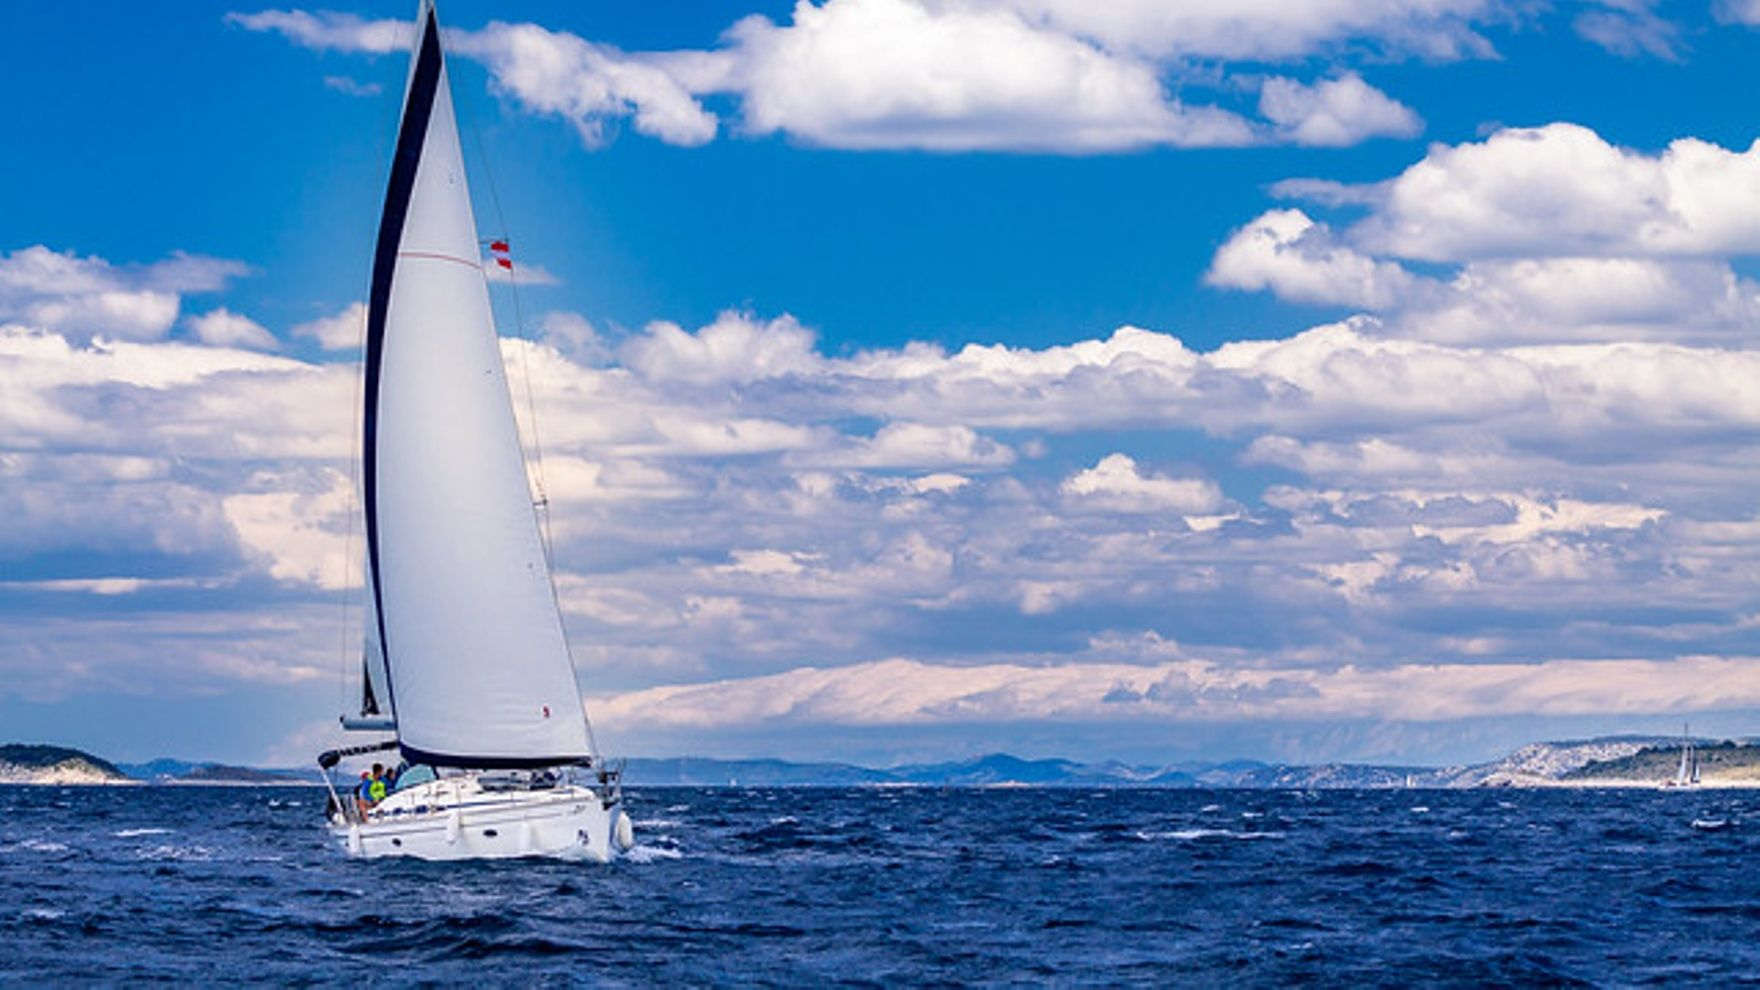 De Monaca club yacht regatta